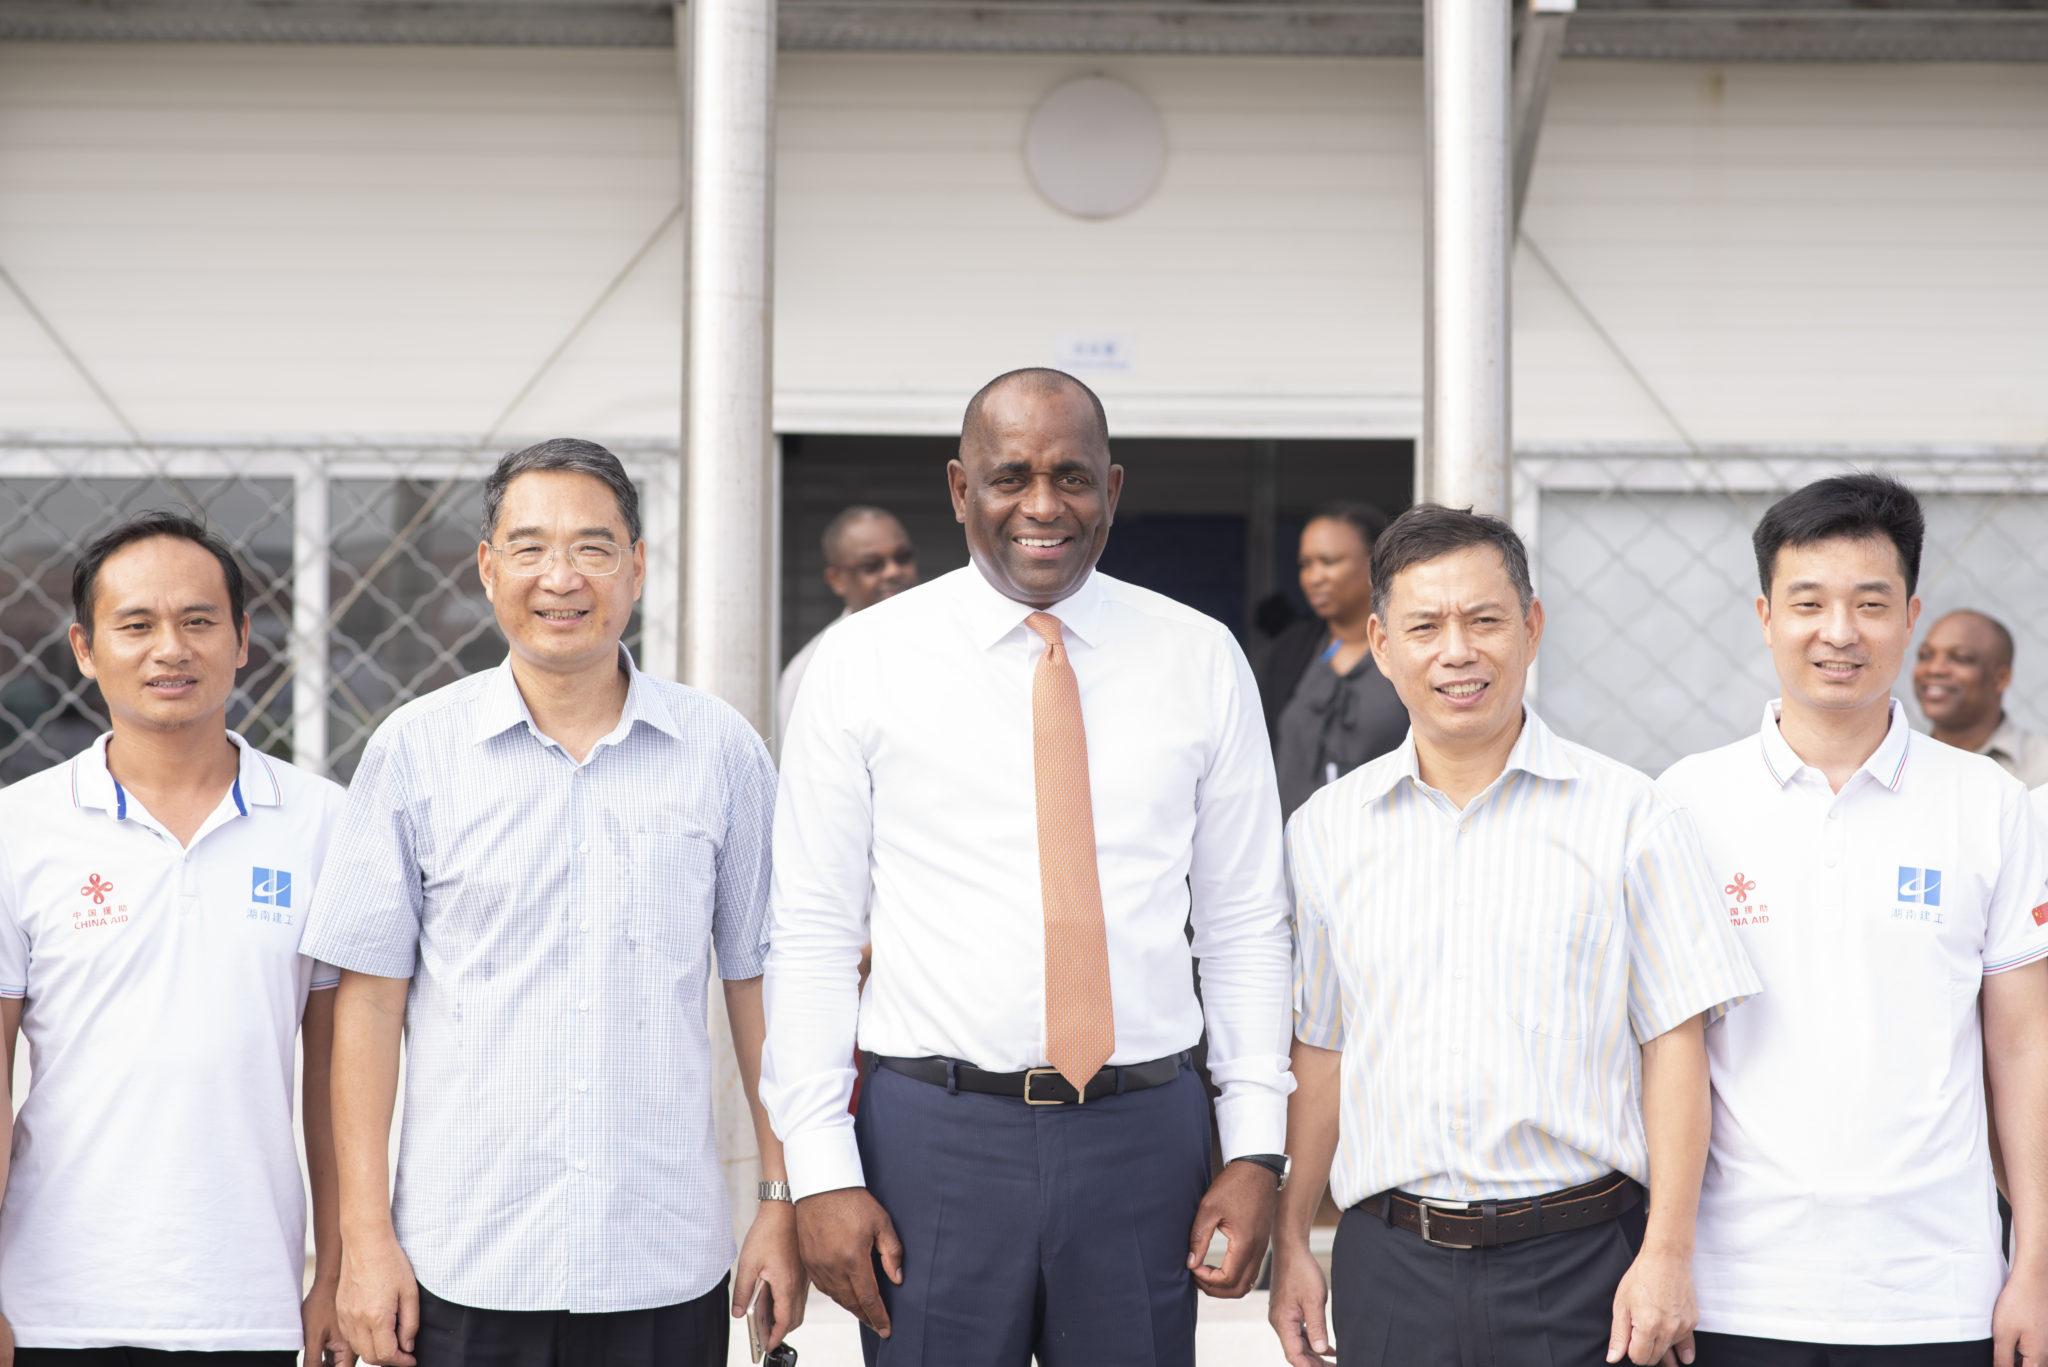 PM Skerrit Visits New Hospital